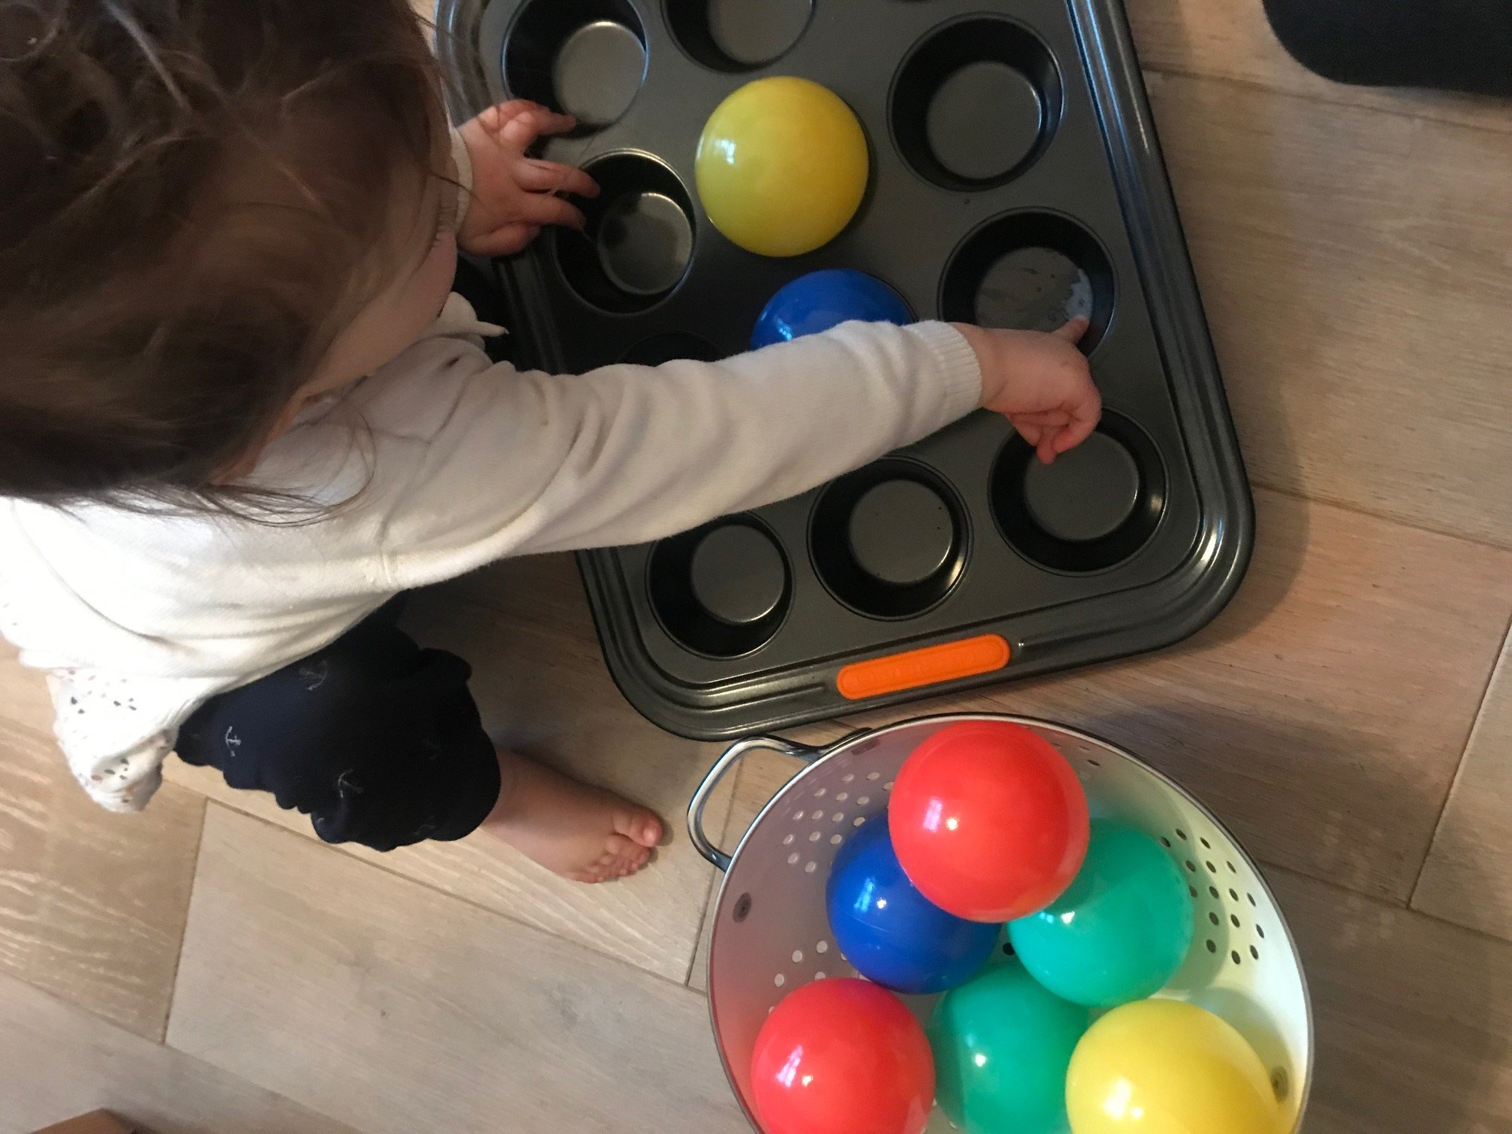 Activite Bebe 1 An Montessori : activite, montessori, Activites-montessori-et-diy-a-faire-avec-bebe-partie-12, Happy, Chantilly